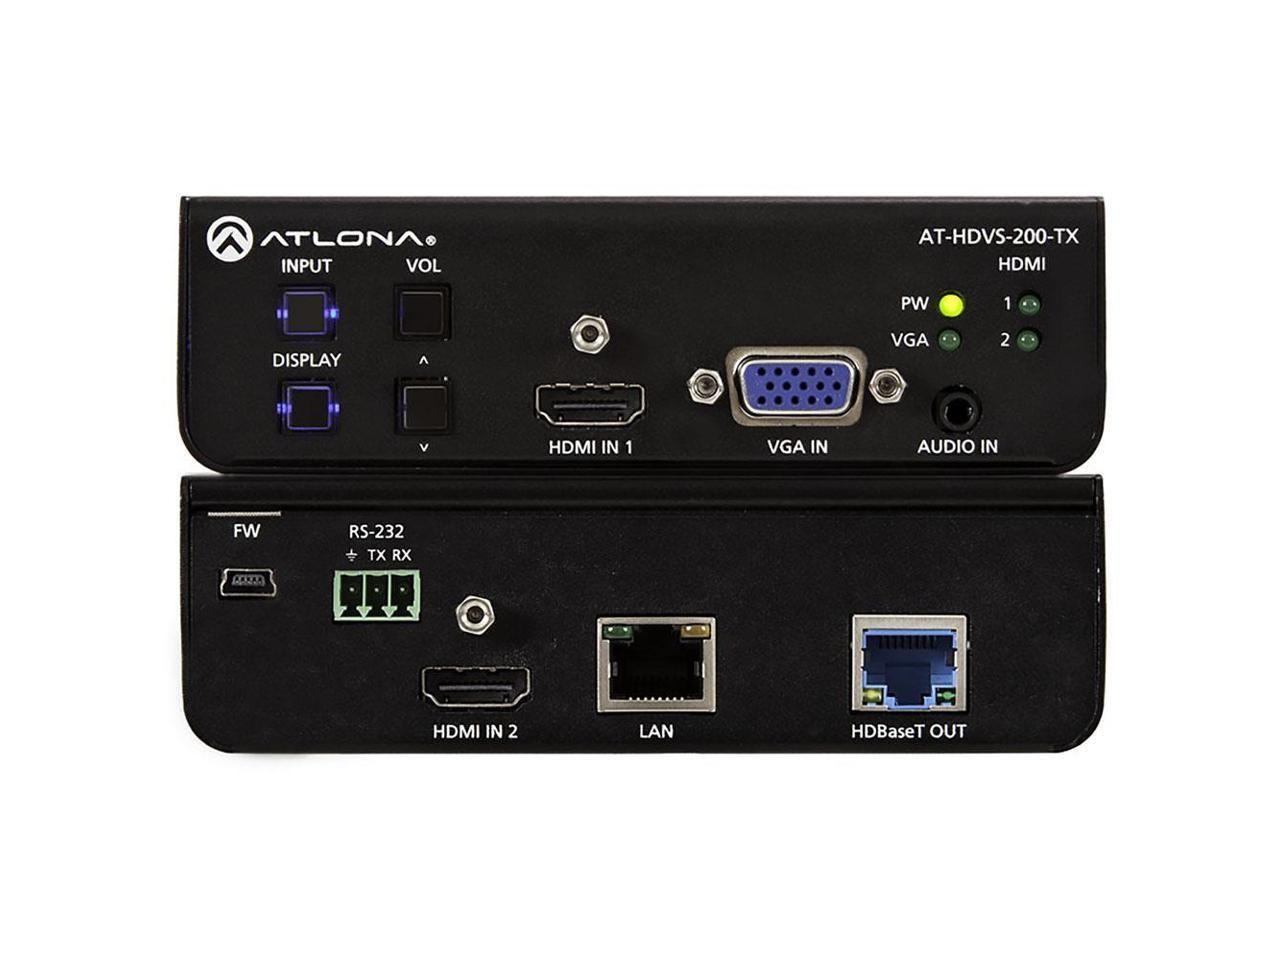 Atlona AT-HDVS-200-TX HDMI VGA Three-Input Switcher